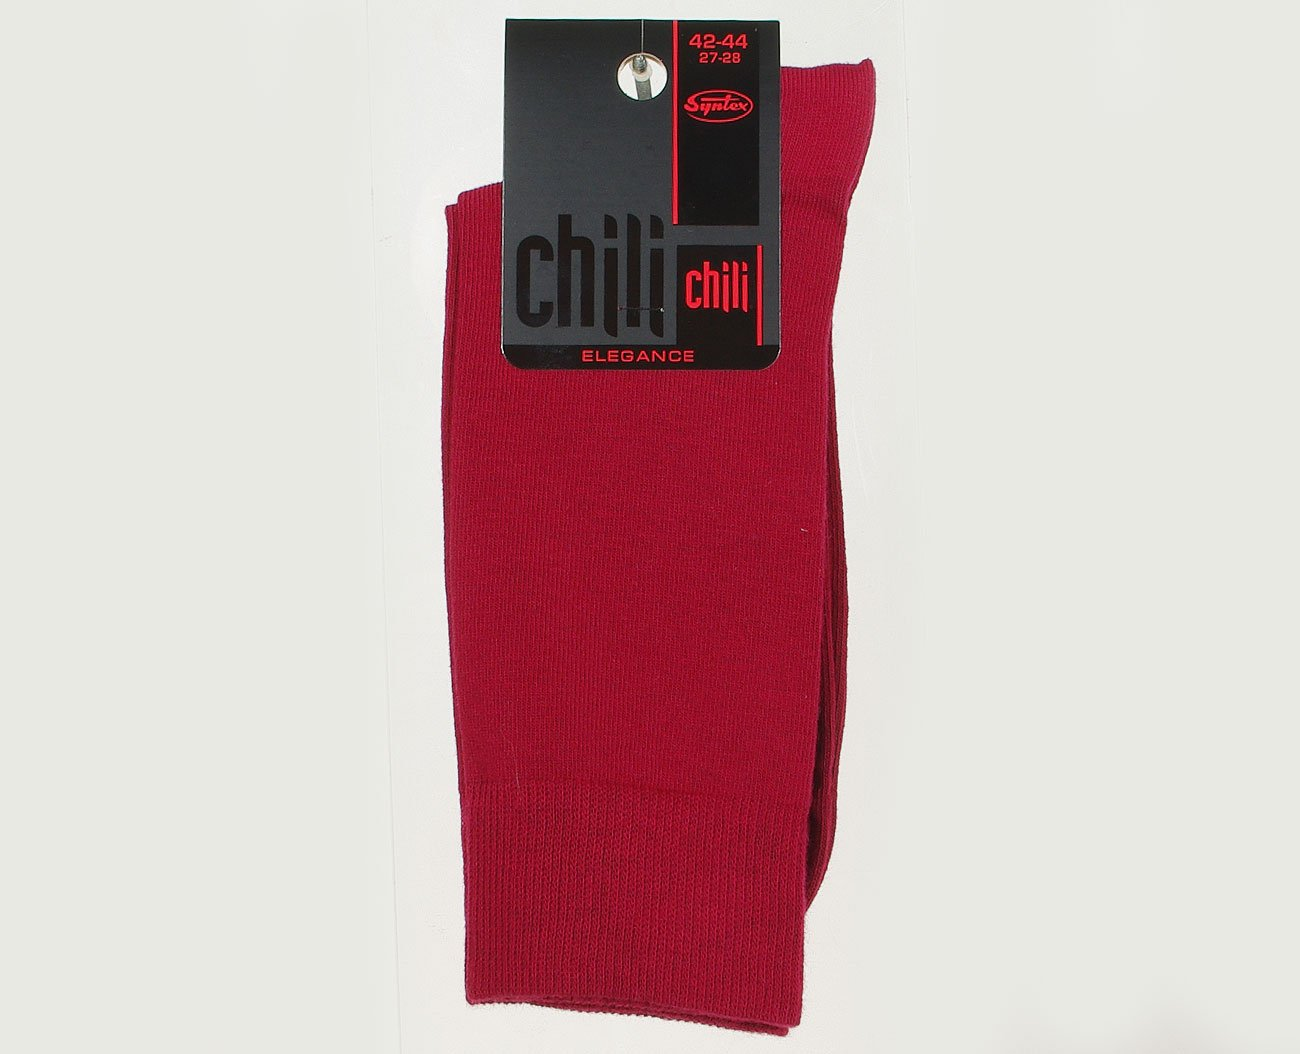 Chili Elegance Gładkie skarpety męskie bordo